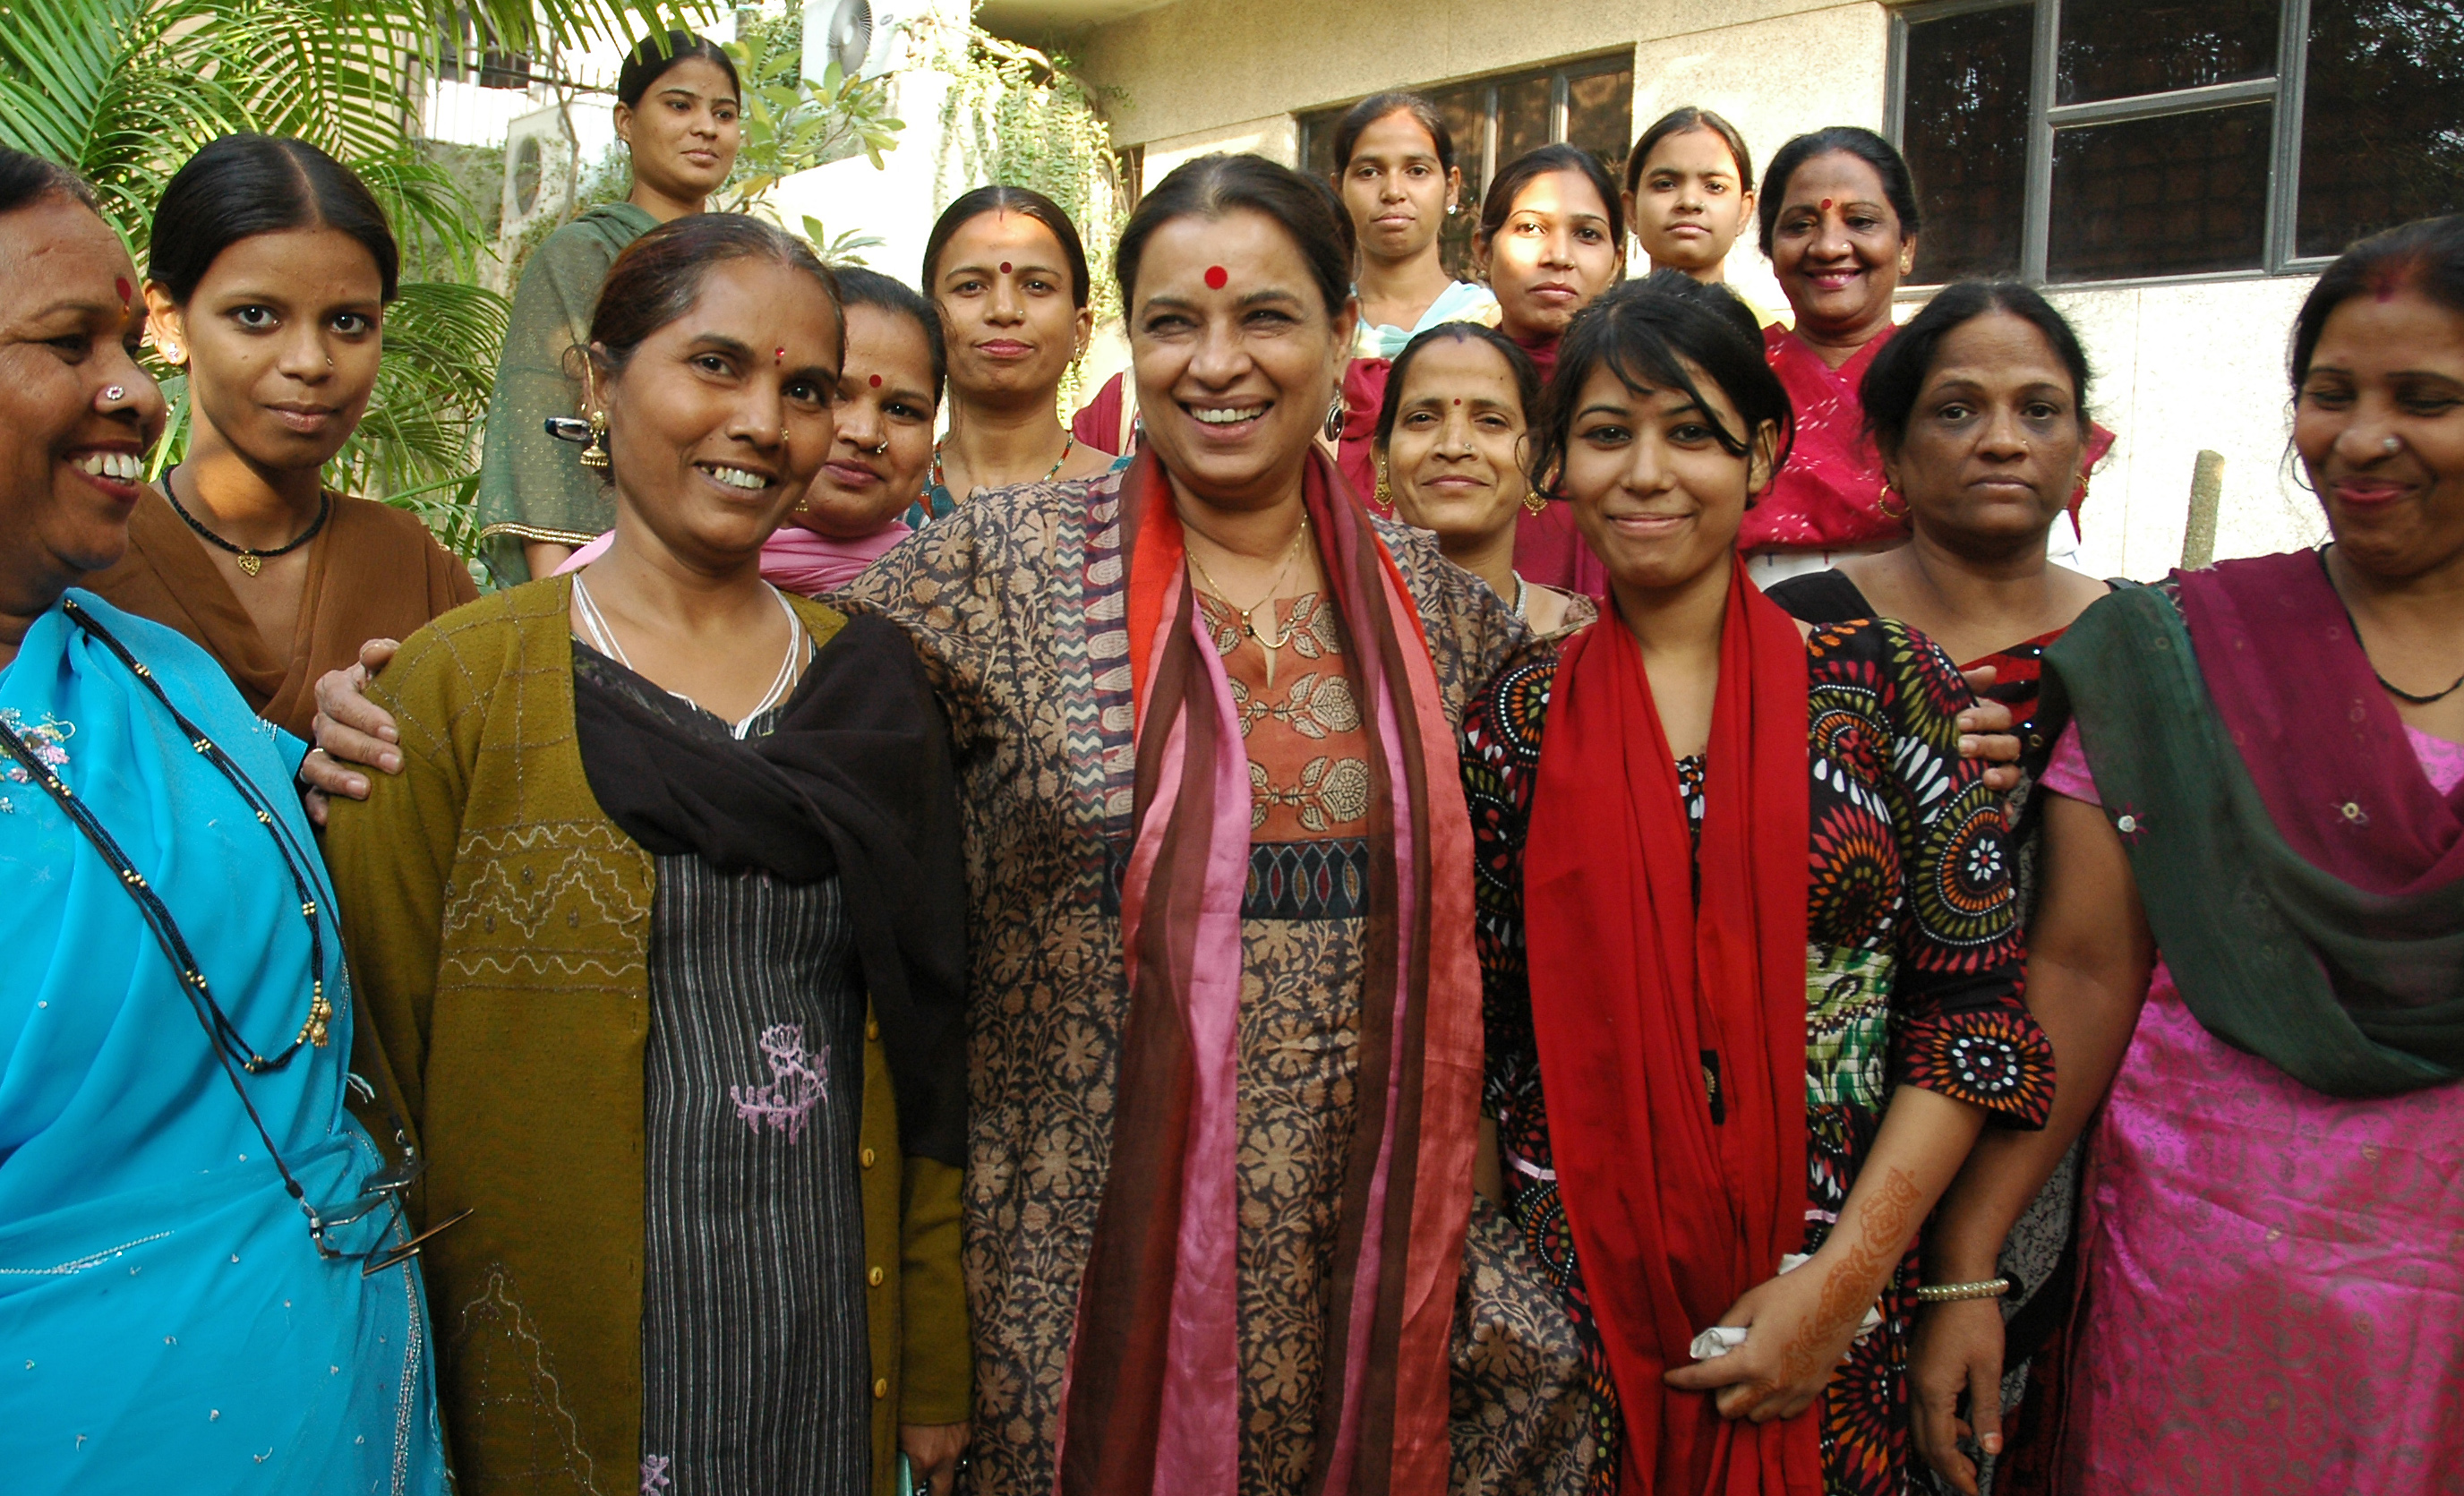 Meet the Woman Extraordinaire - Dr  Ranjana Kumari - Sayfty